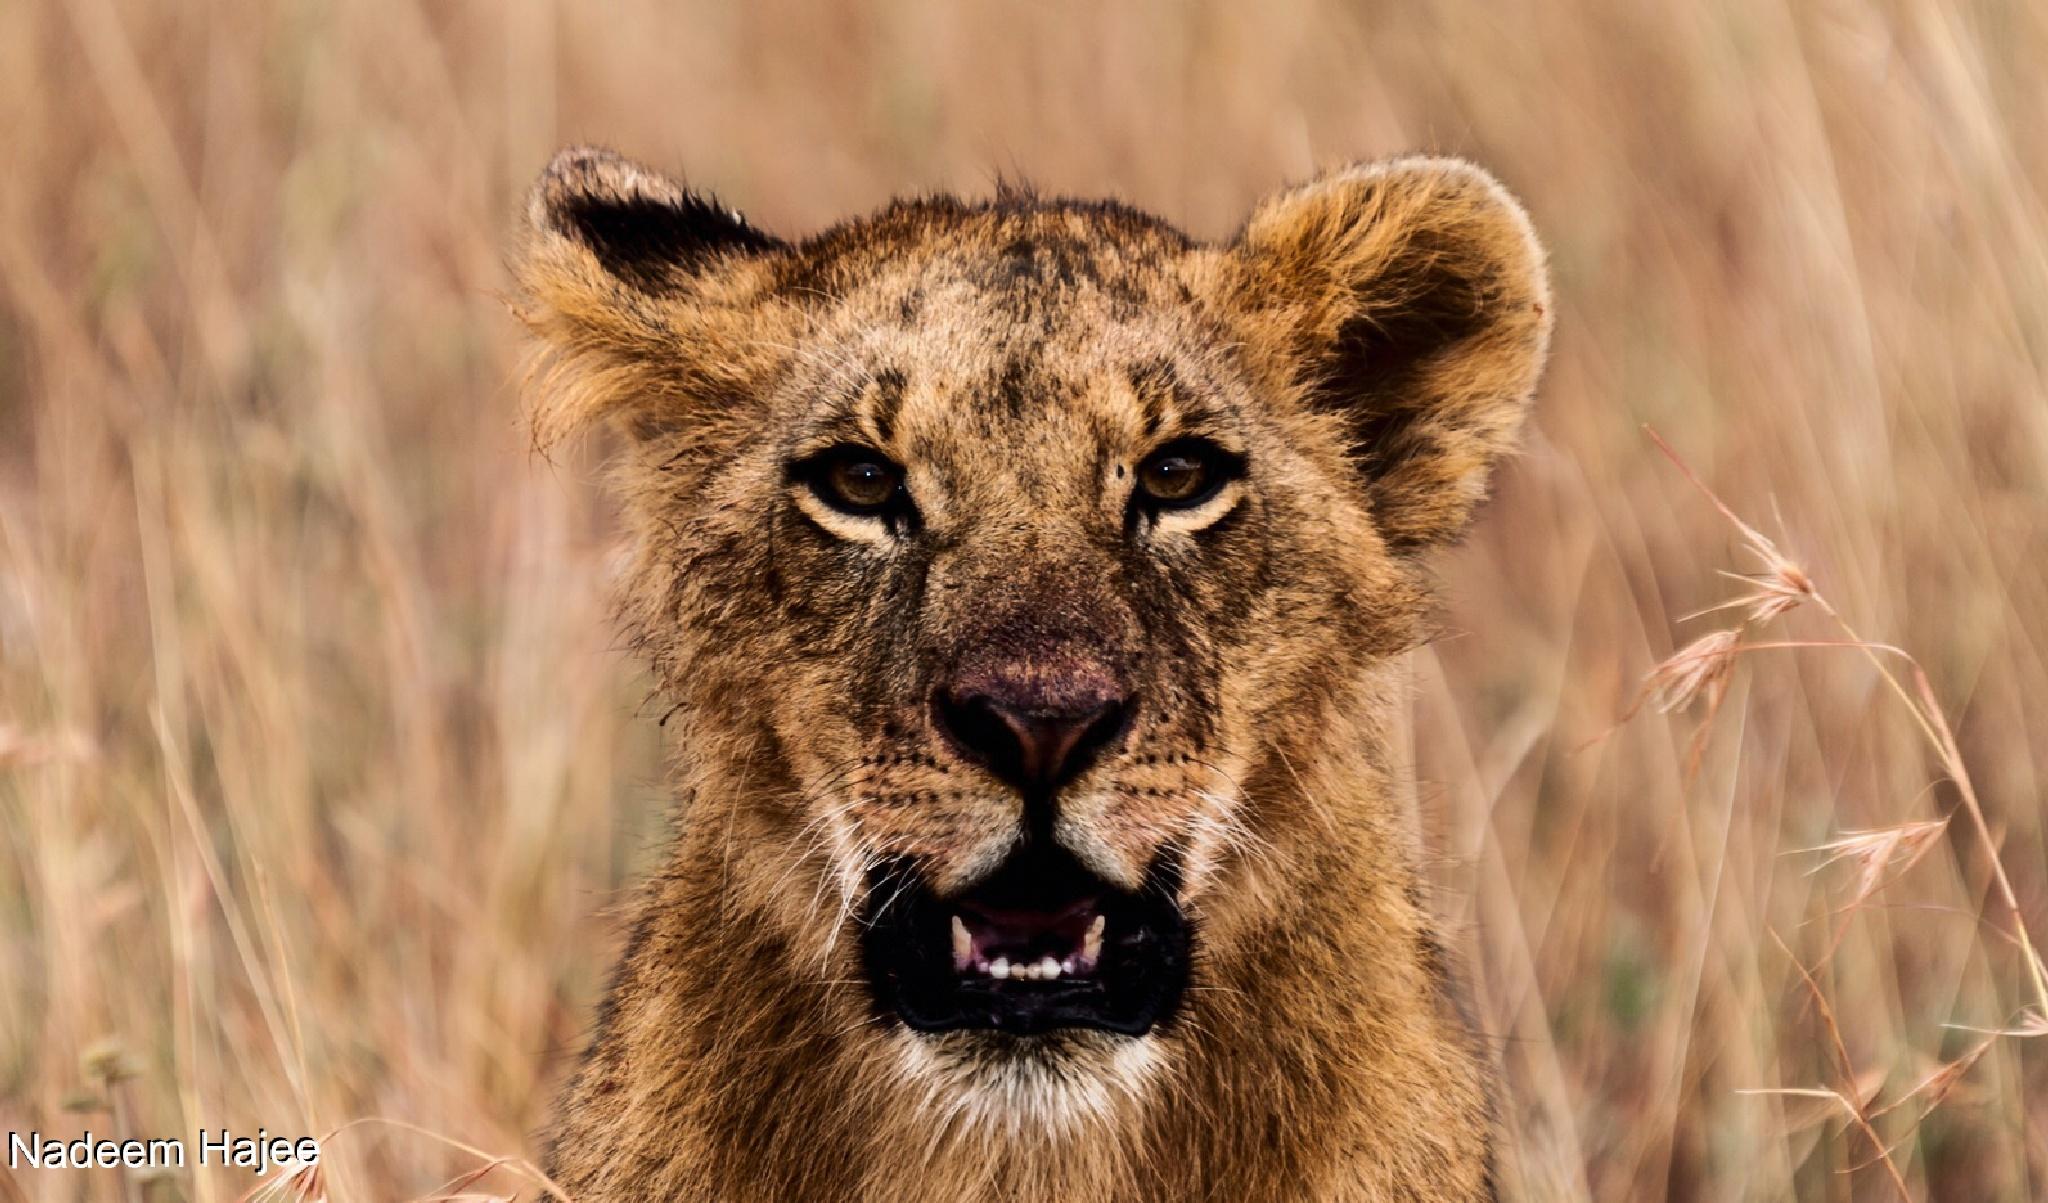 Angry Teen look by Nadeem Hajee